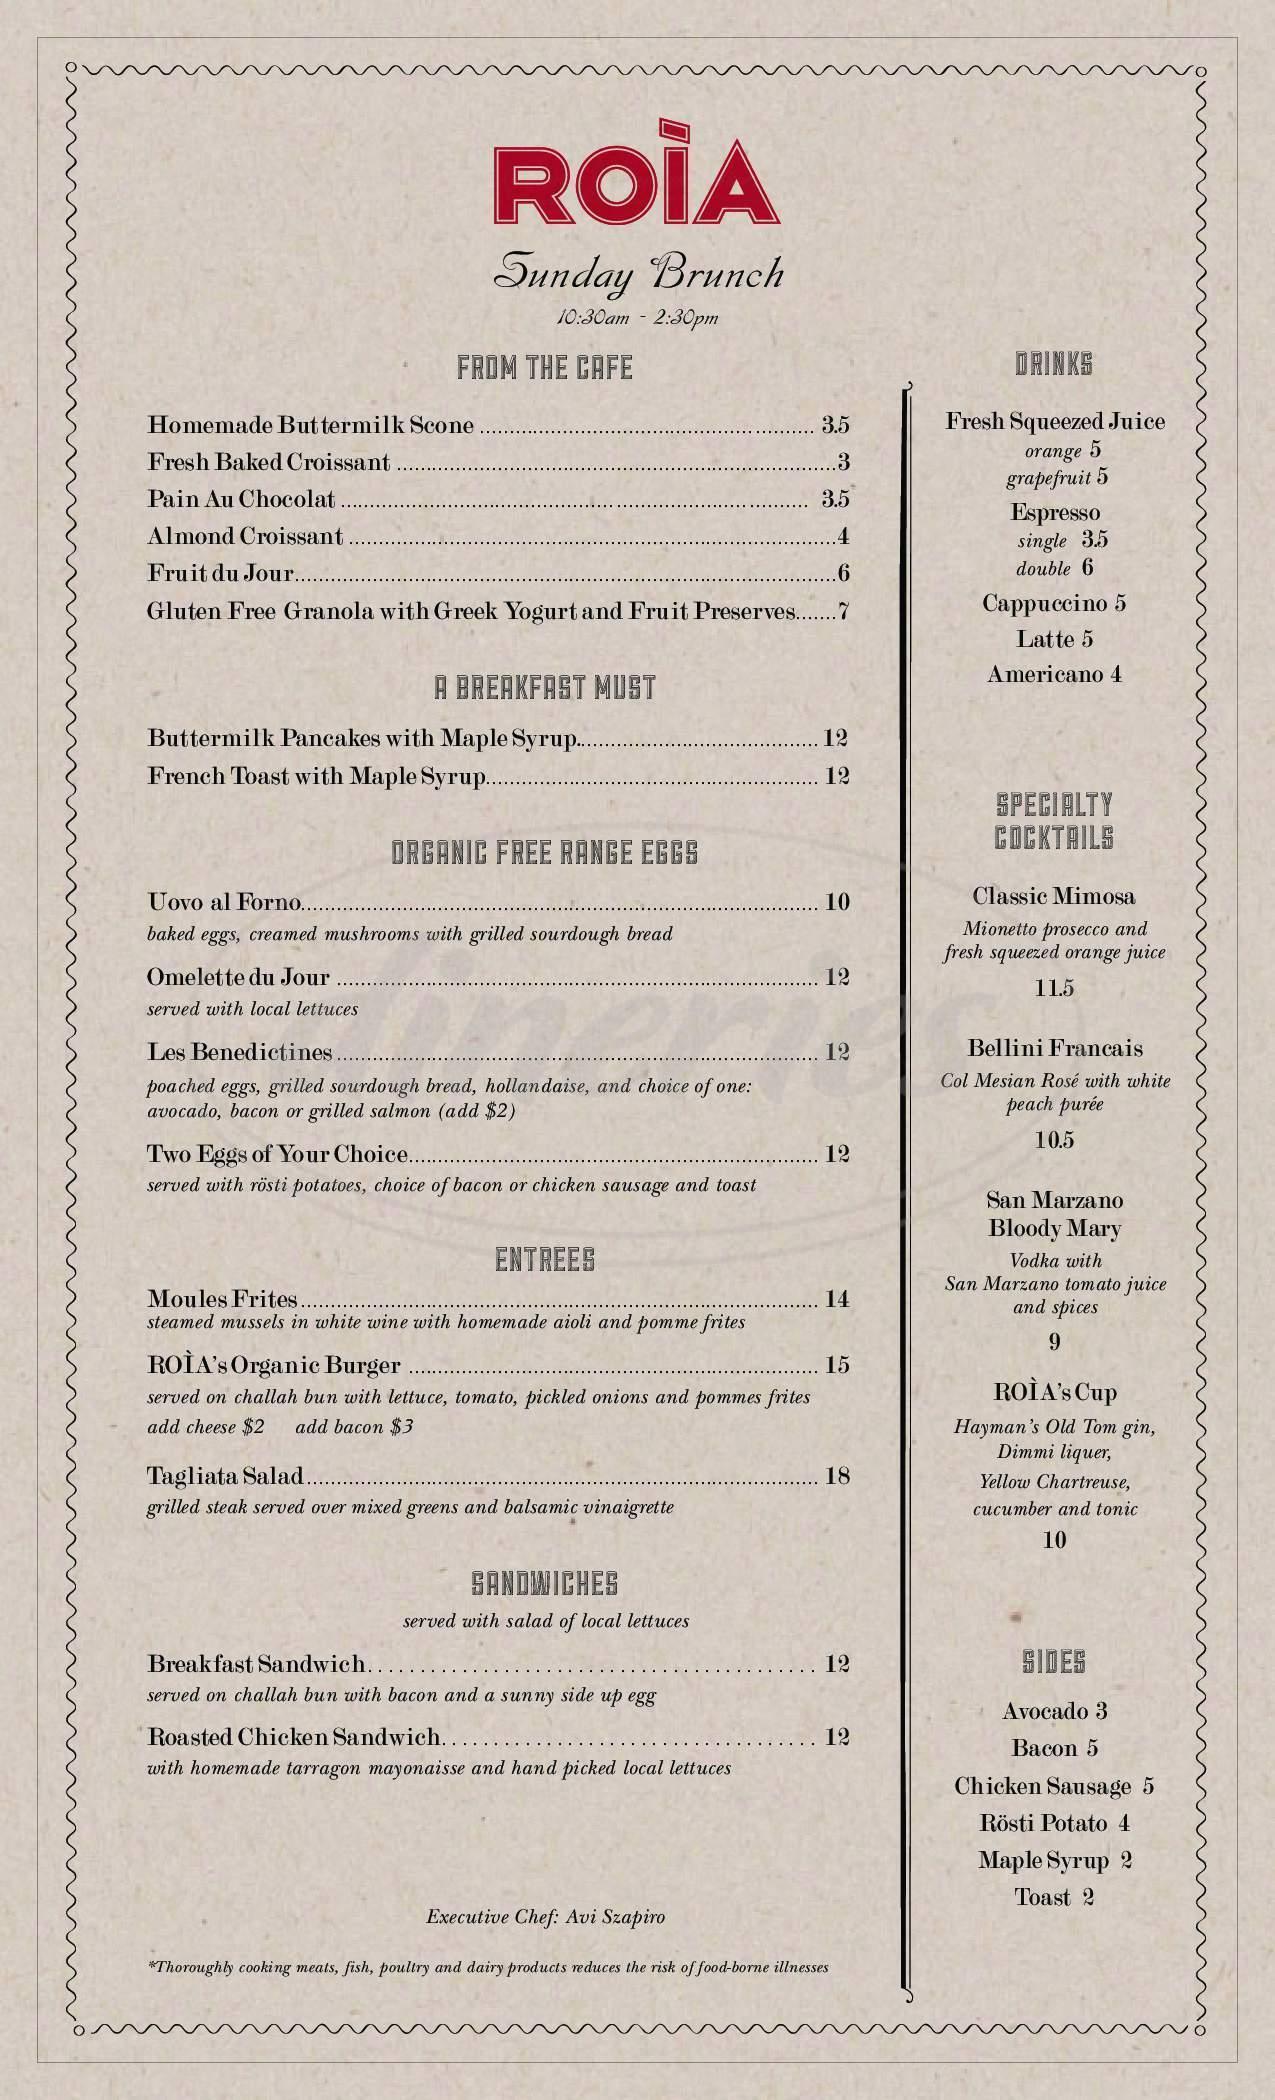 menu for ROIA Restaurant and Cafe